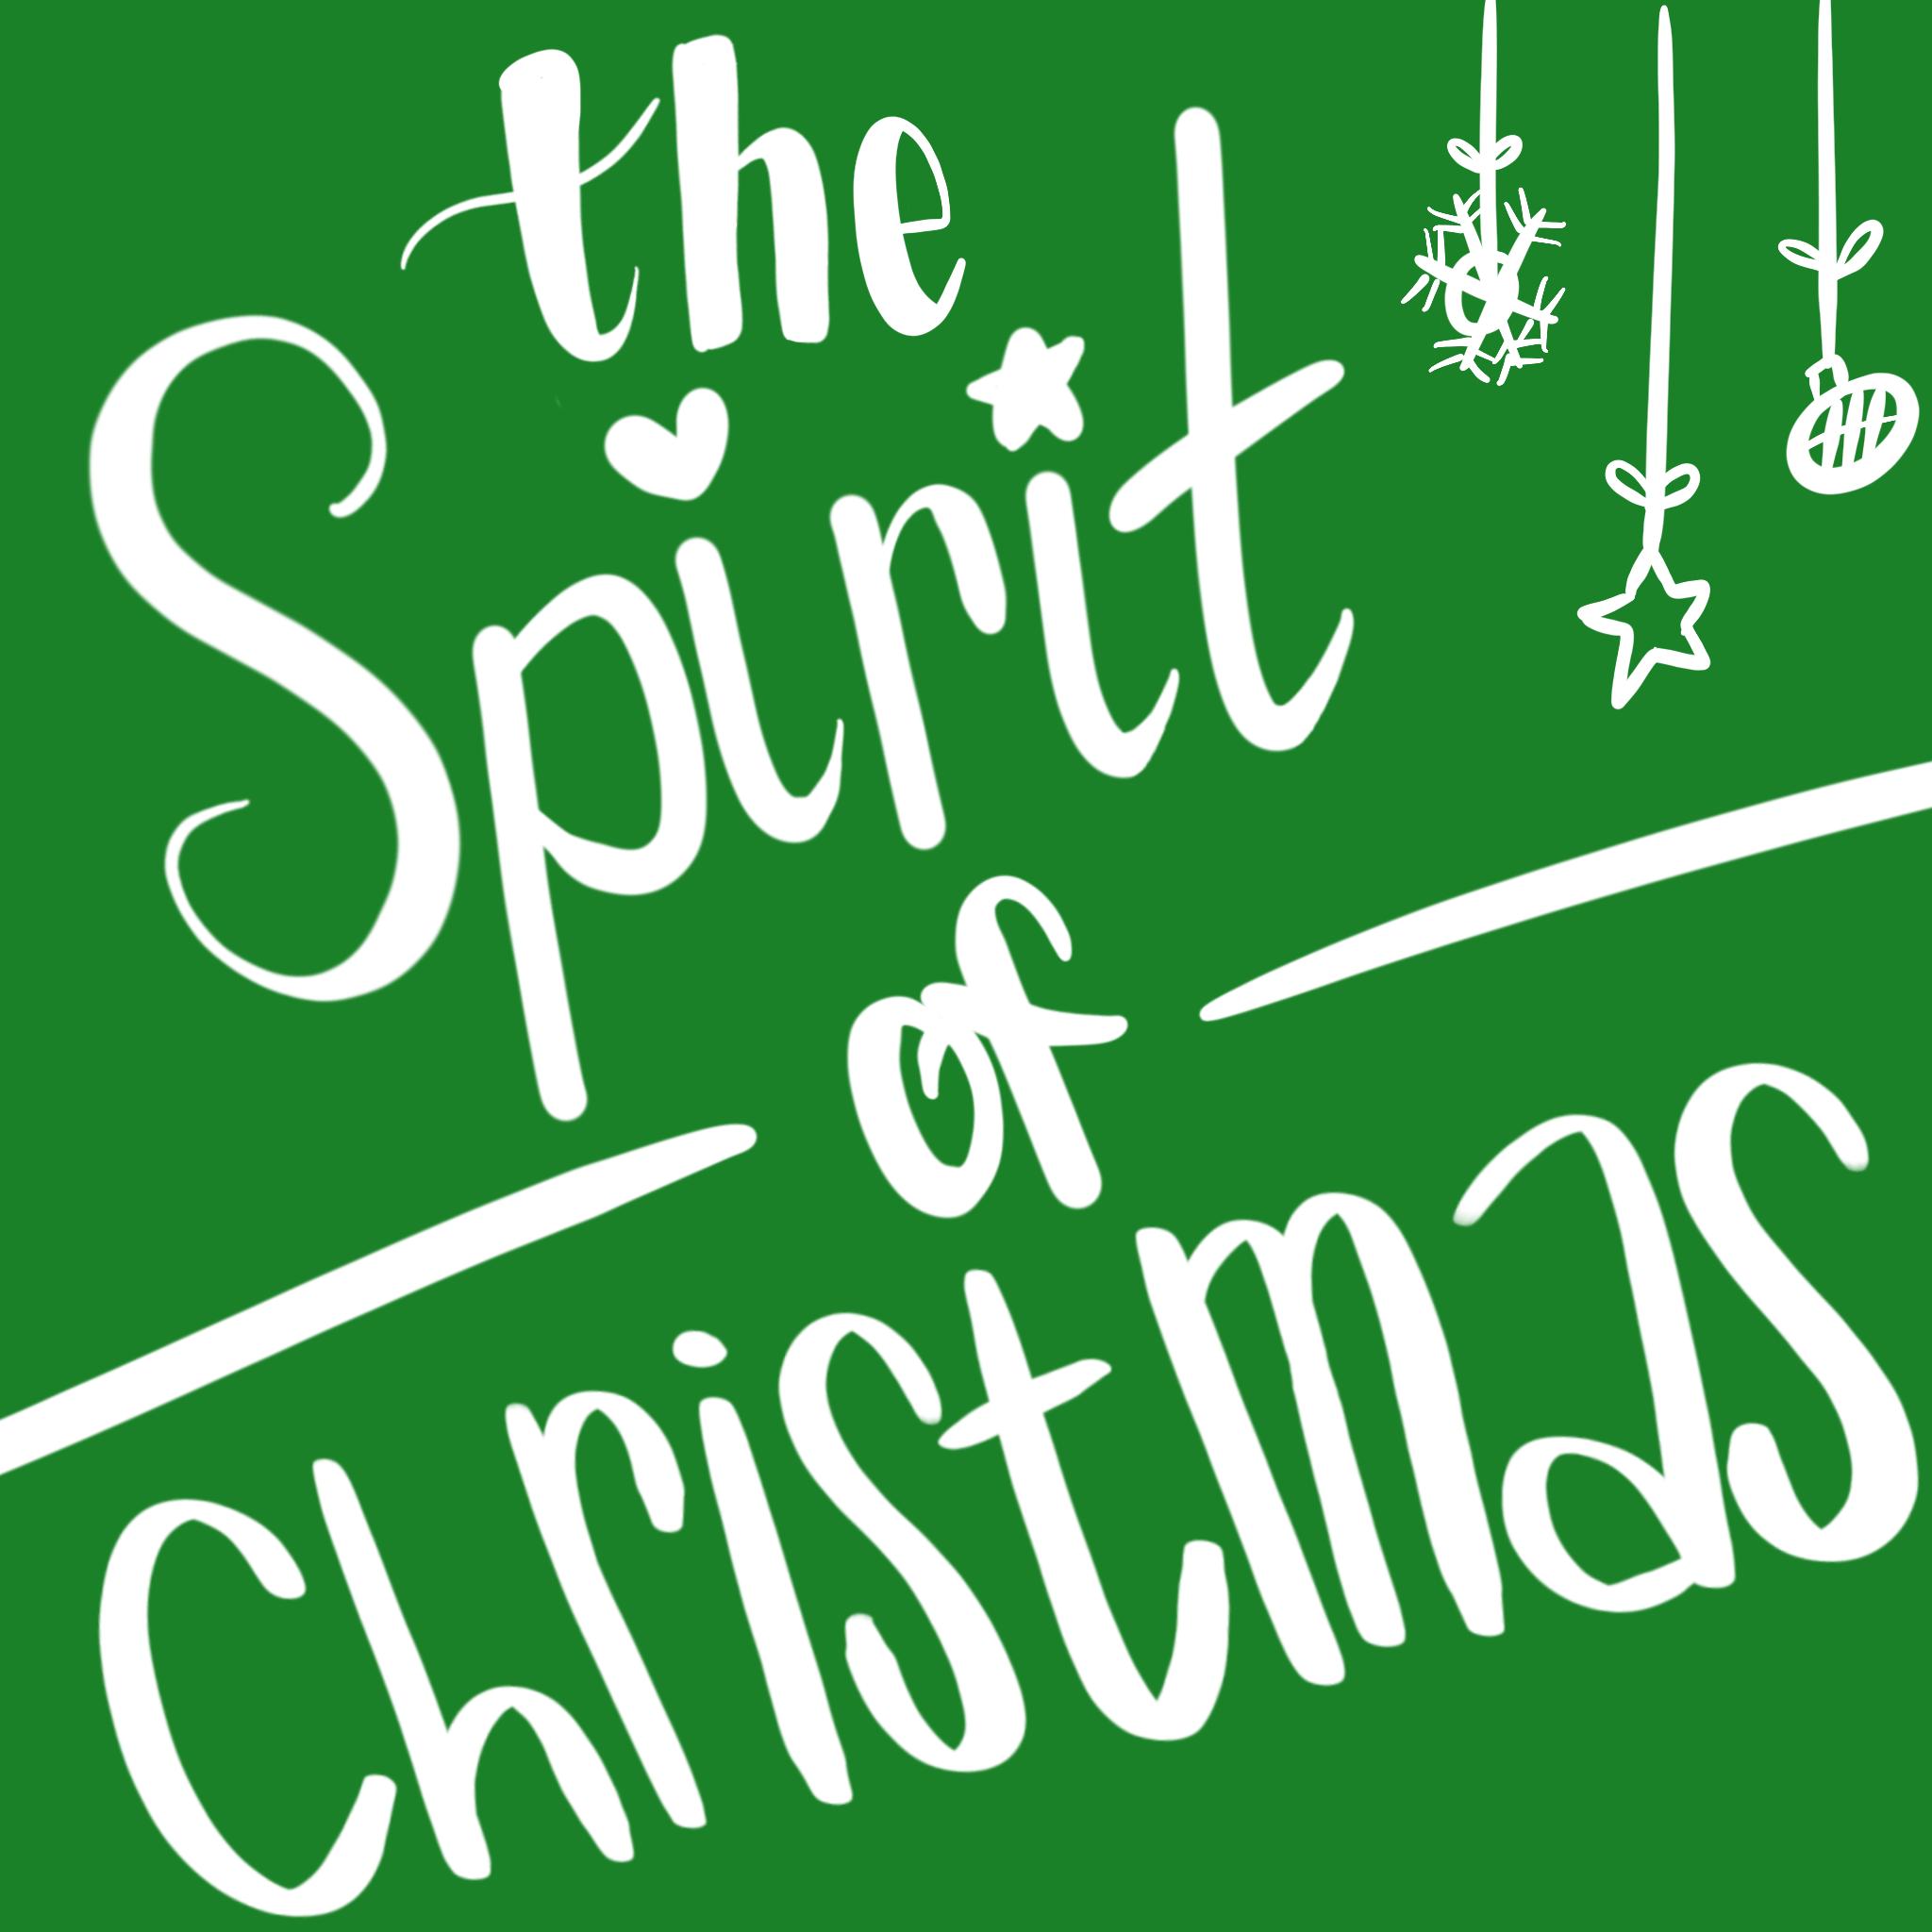 Spirit of Christmas.png